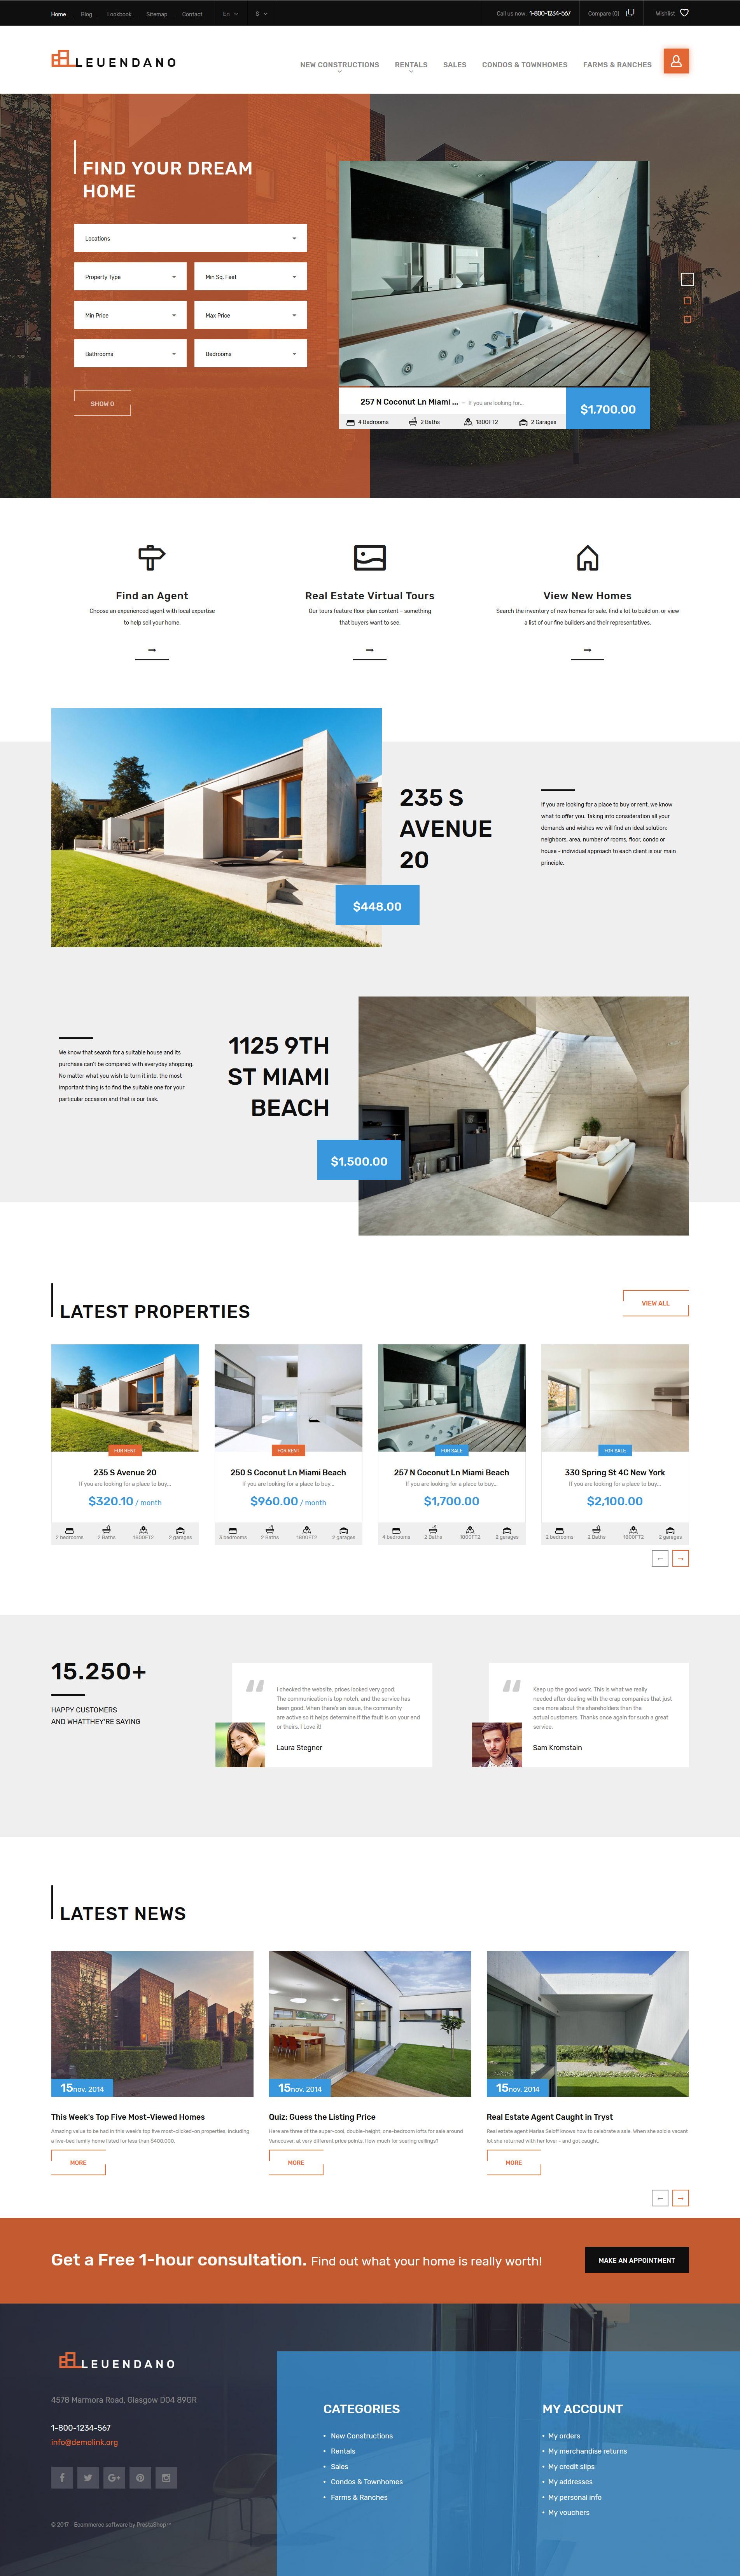 """Leuendano - Real Estate Agency Responsive"" - адаптивний PrestaShop шаблон №63856"